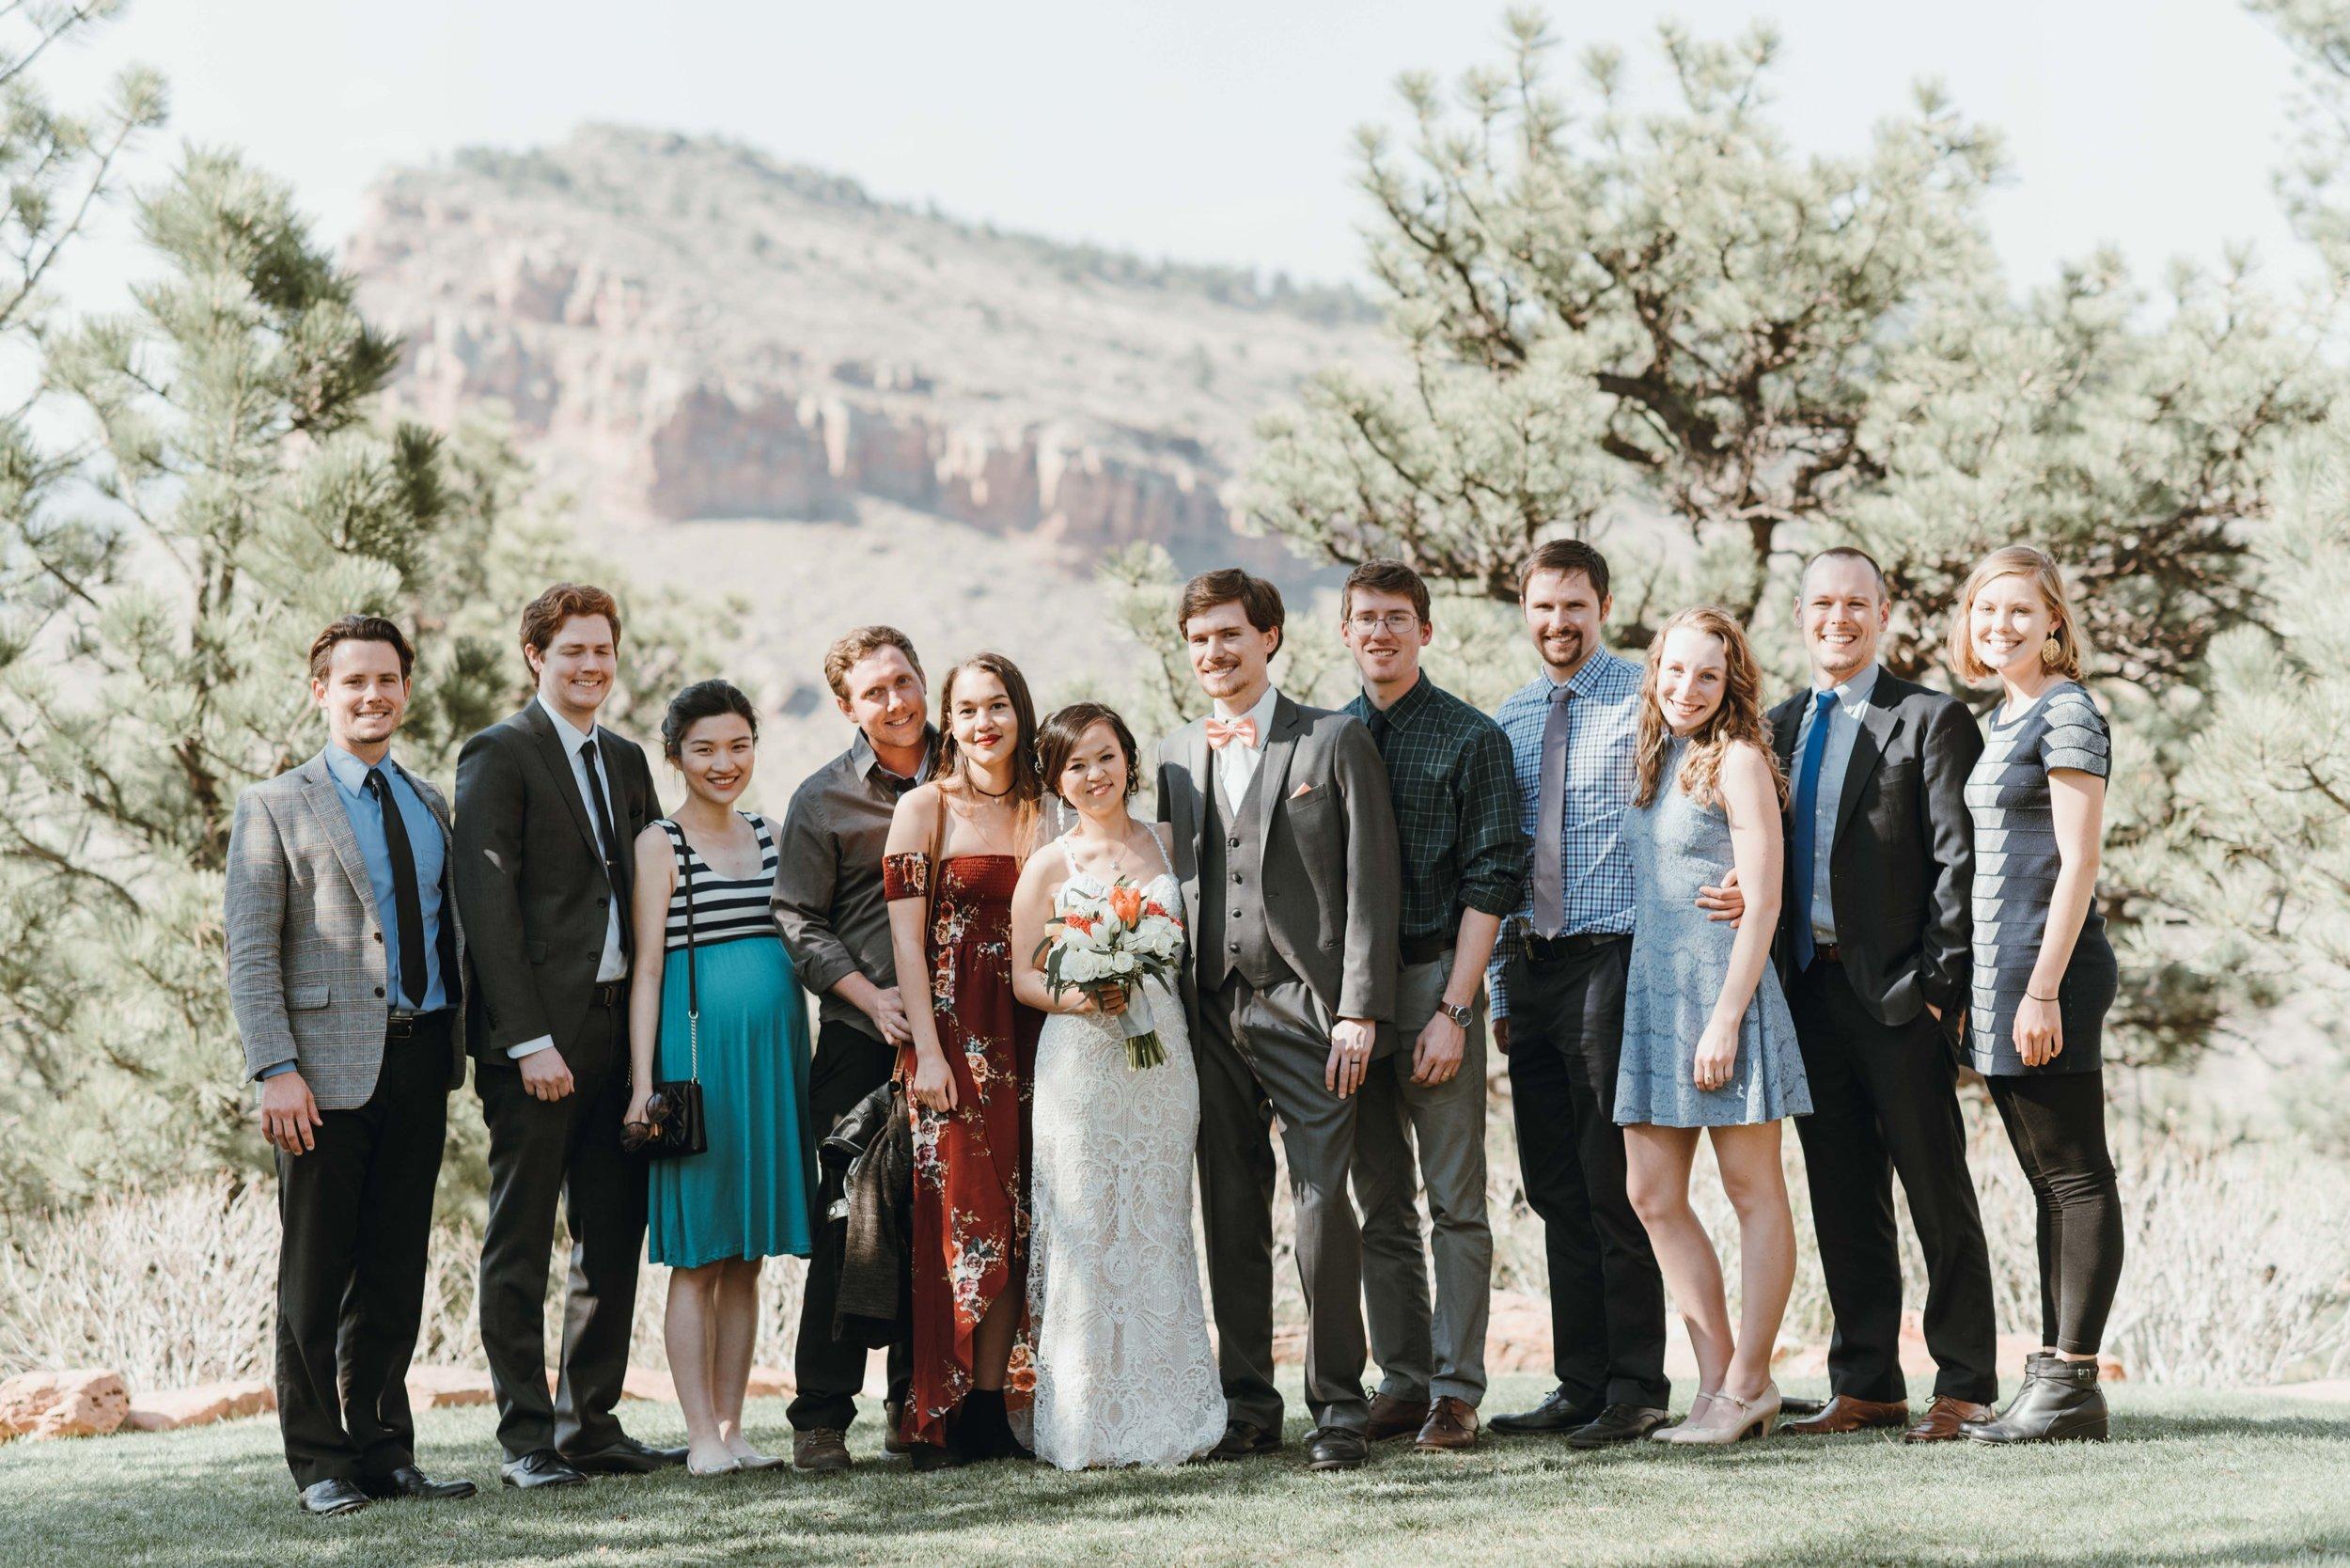 denver wedding photographer lioncrest manor in lyons ben and mali -DSC_1760.jpg